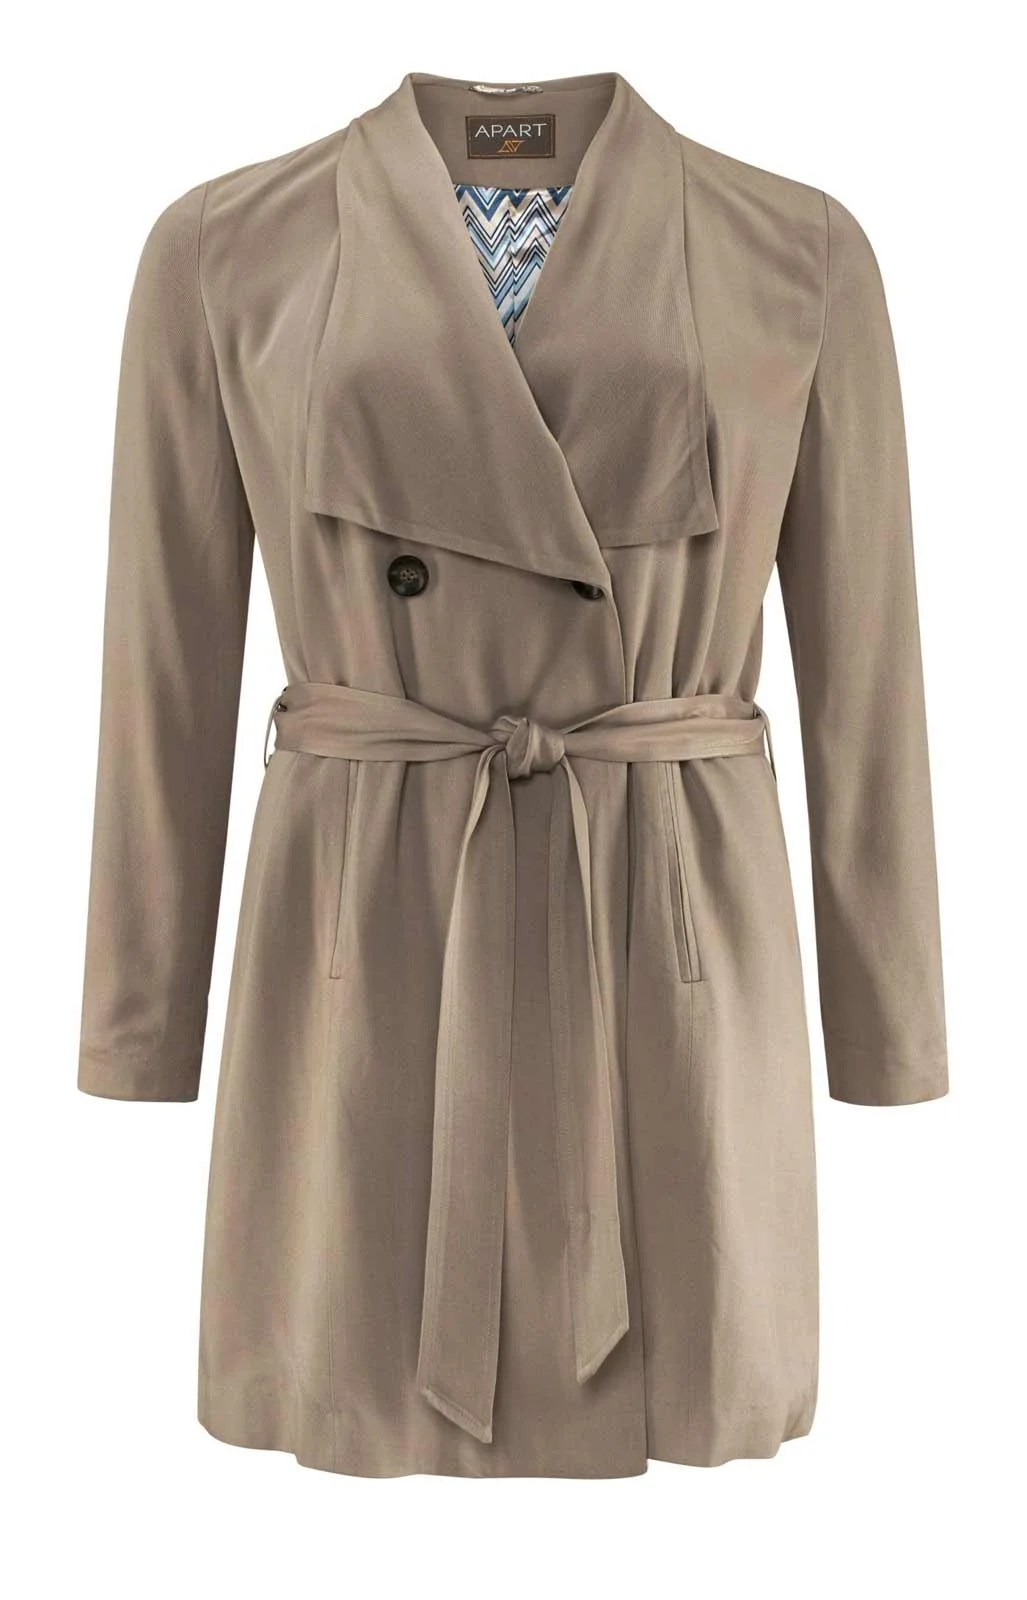 442.535 APART Damen Designer-Trenchcoat Taupe Mantel Bindegürtel Trench Viskose Top